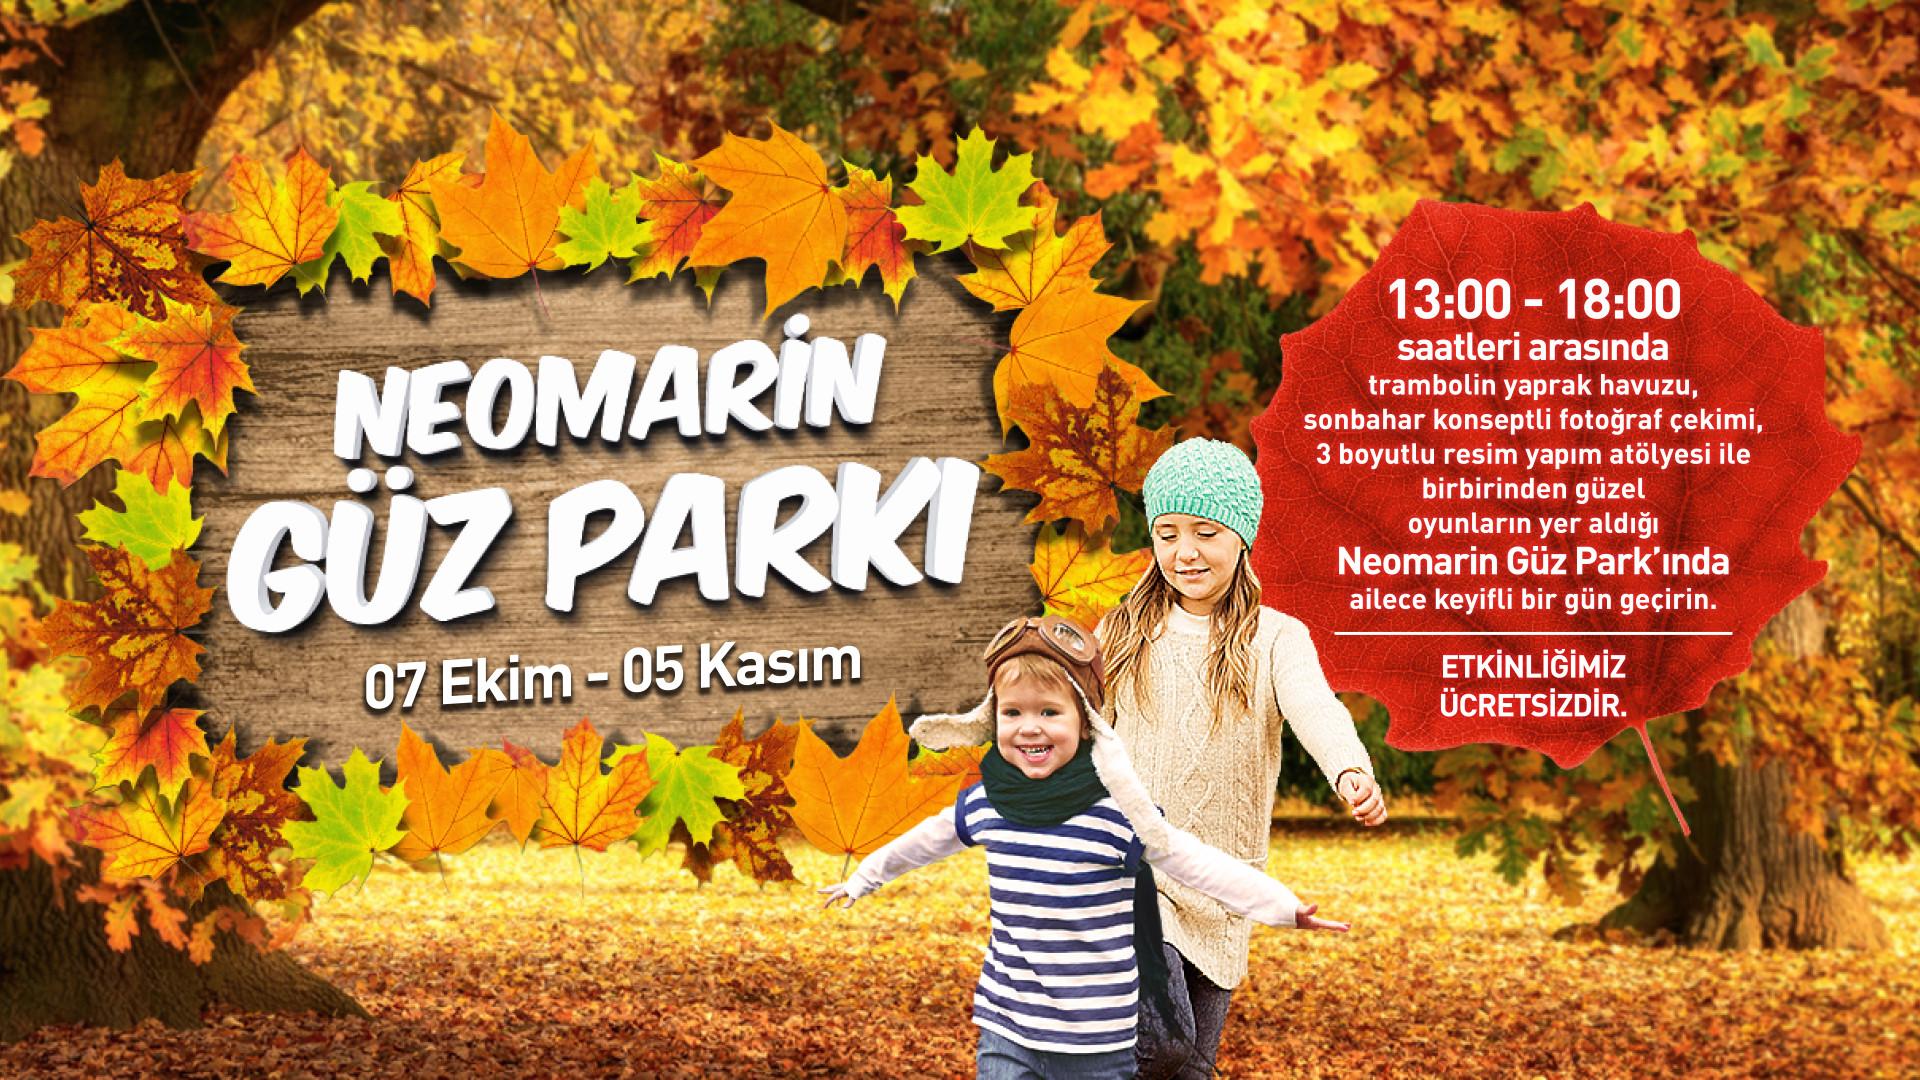 Neomarin Güz Parkı